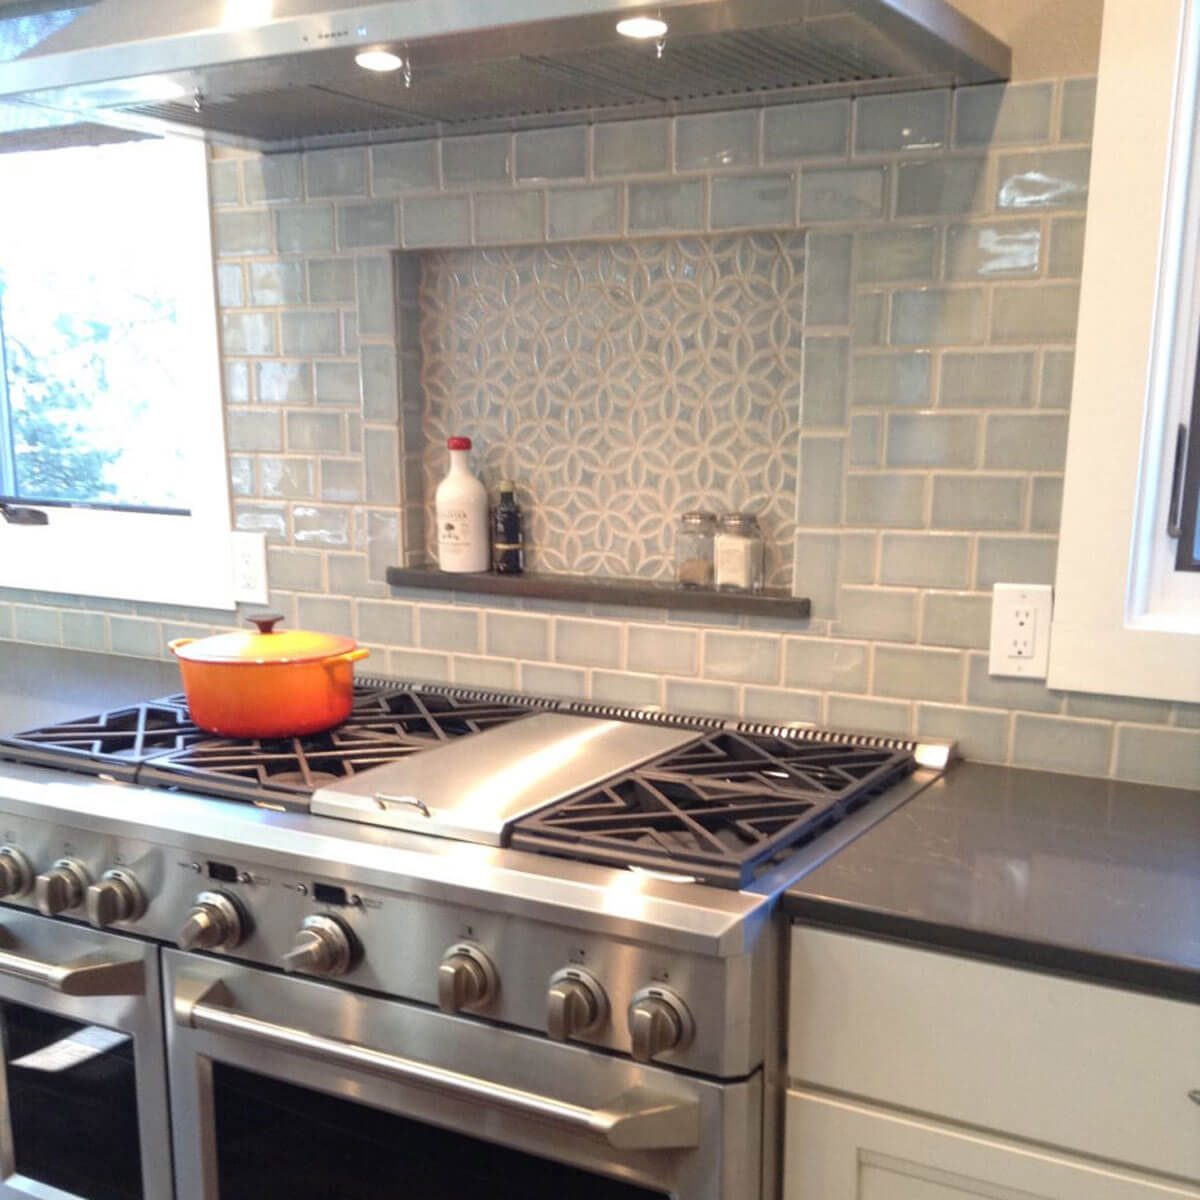 Monochromatic grey tile backsplash